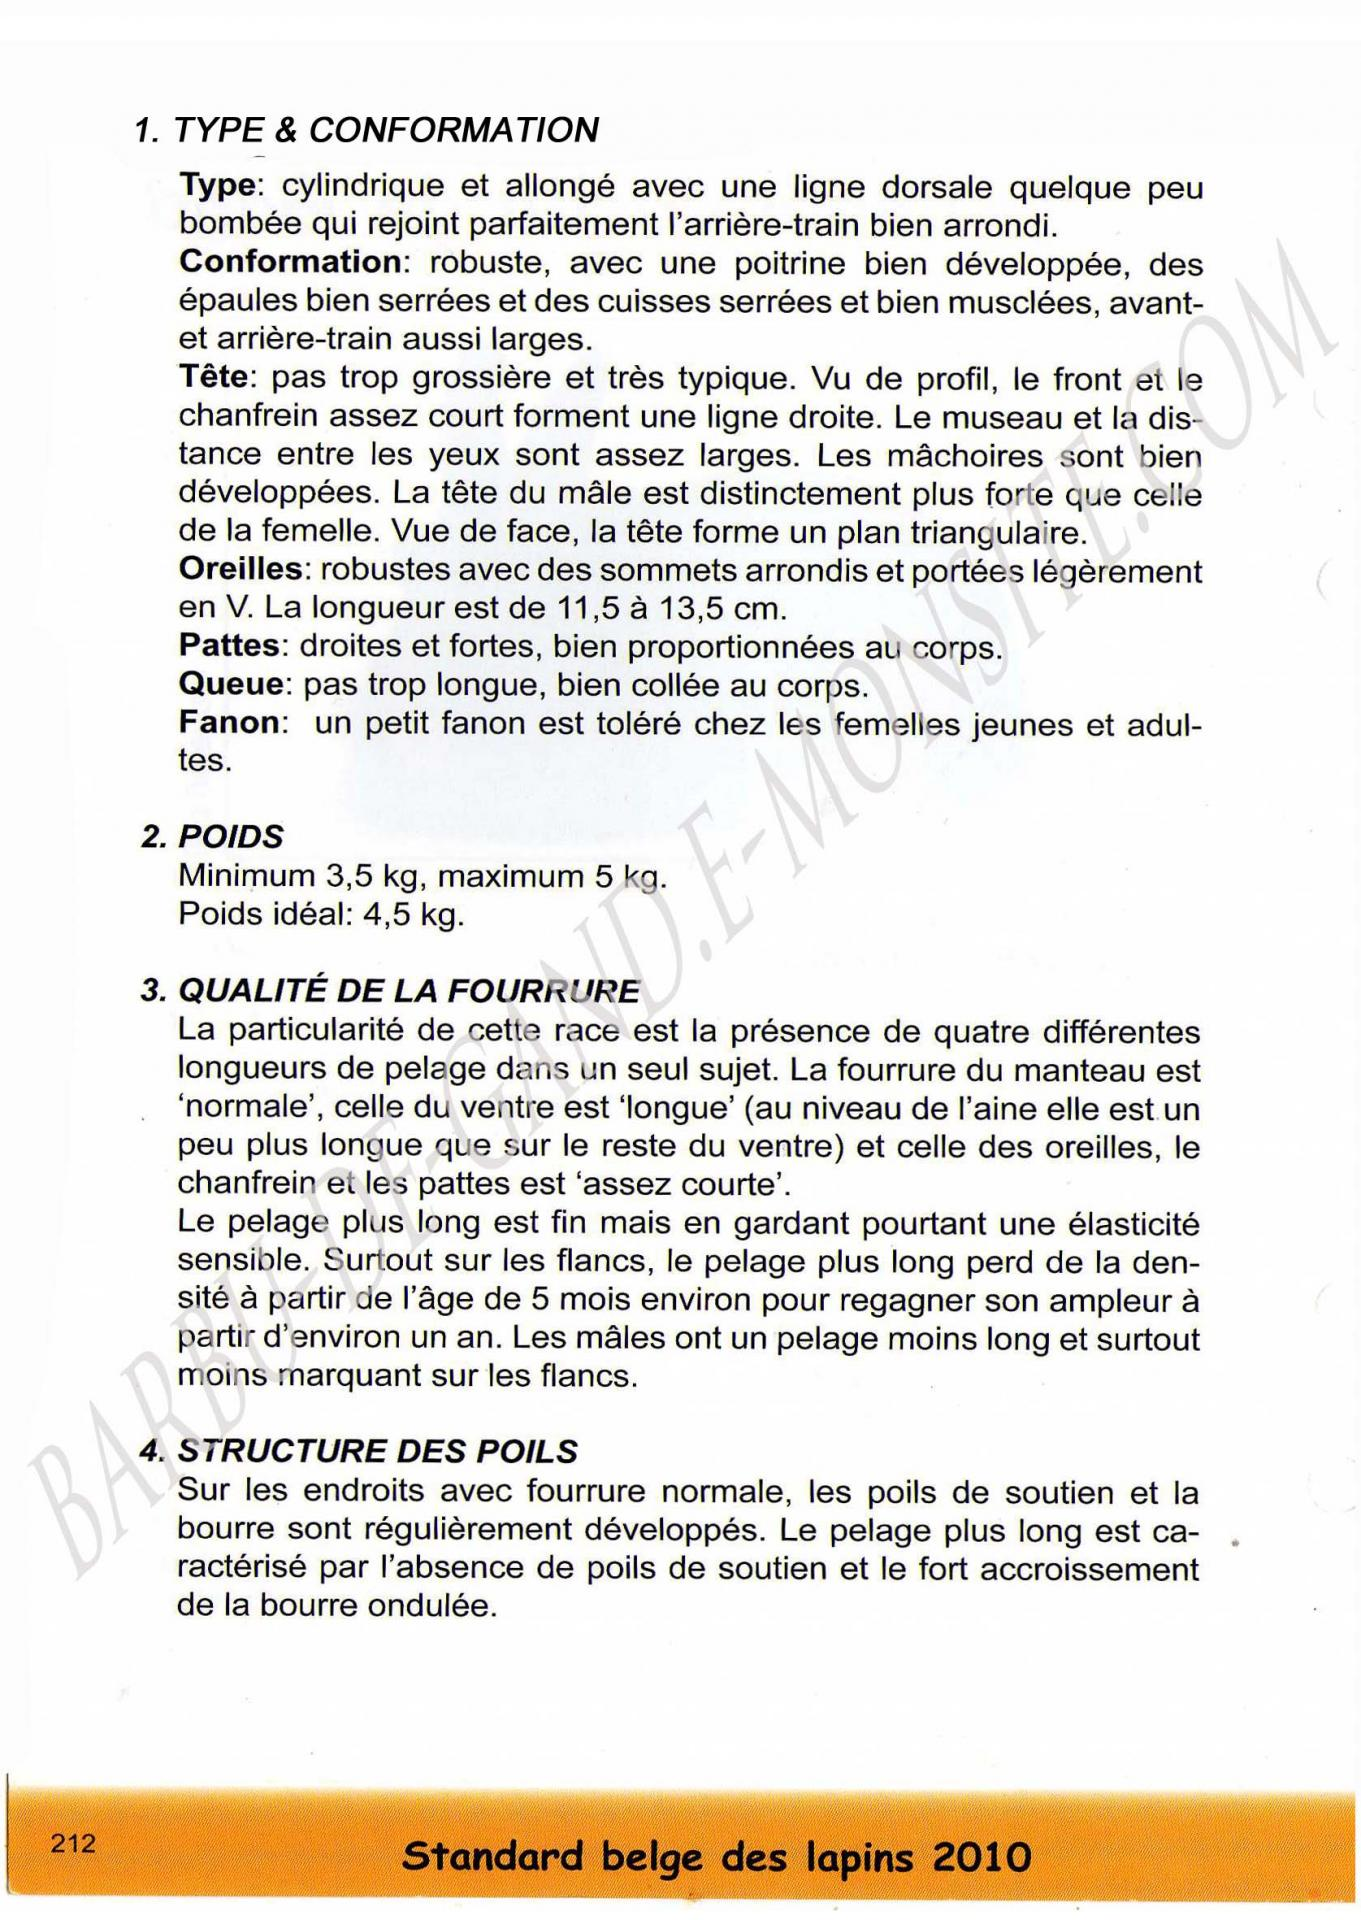 Standard belge 2 filigrane